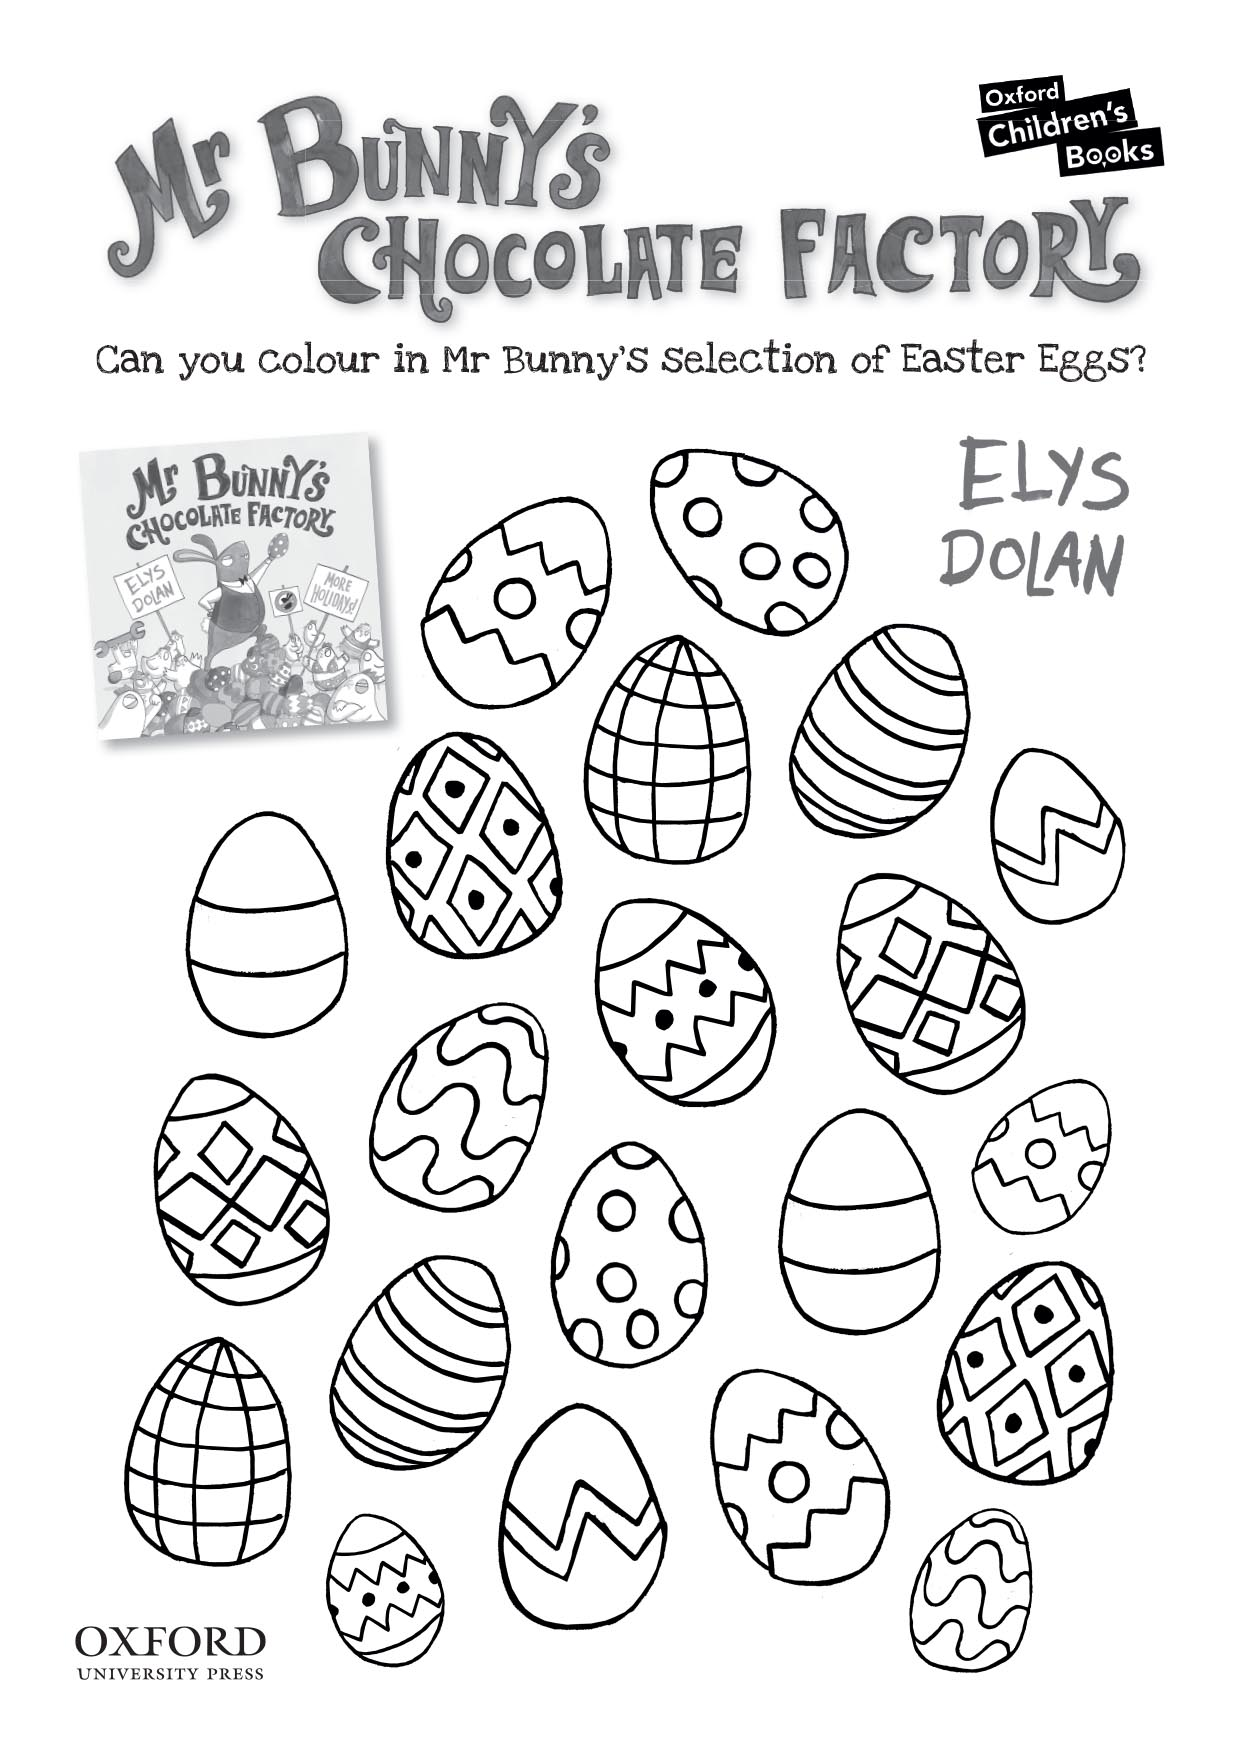 Mr Bunny's Chocolate Factory colour easter eggs.jpg